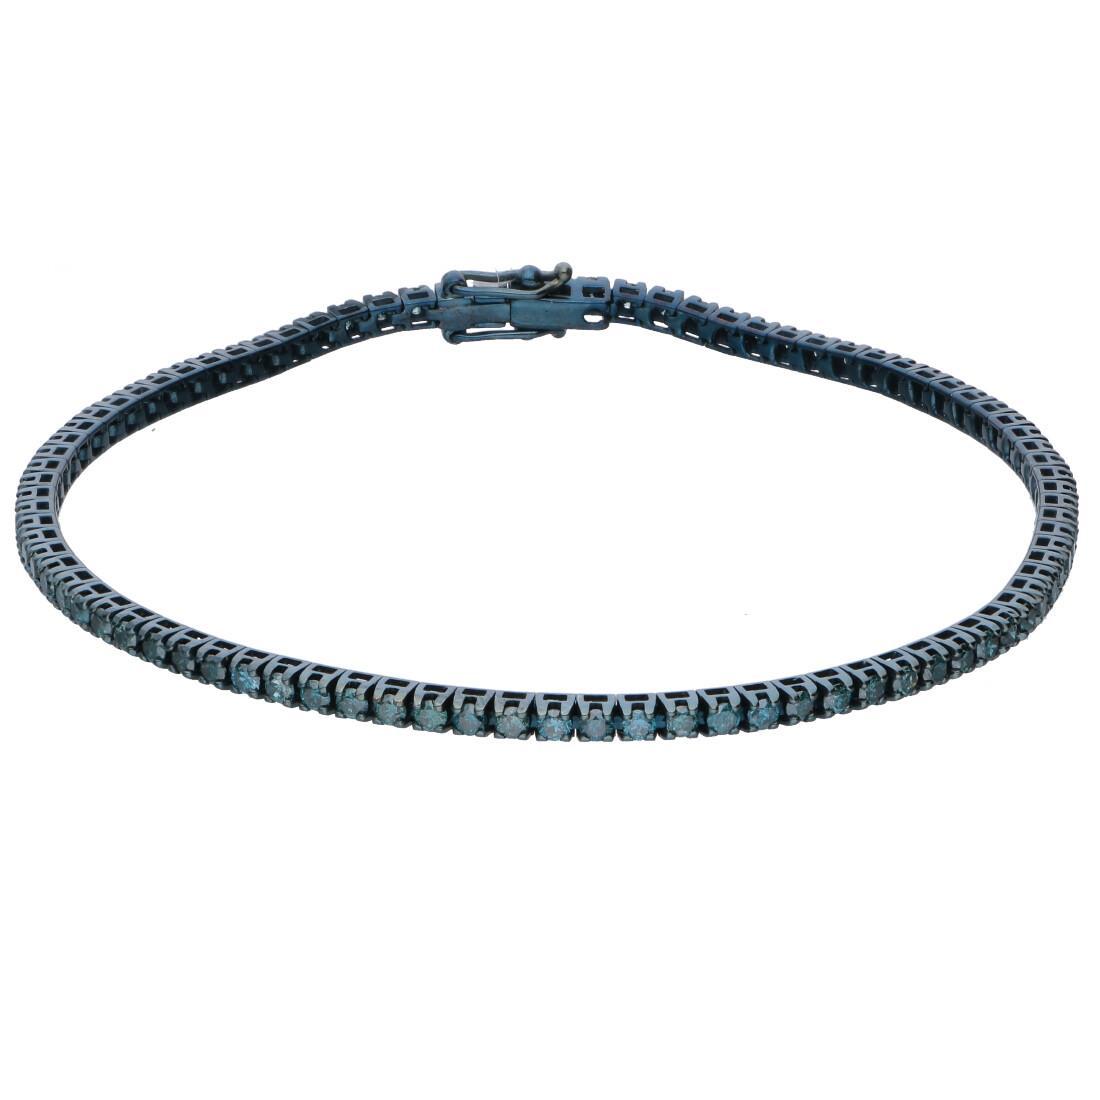 Bracciale tennis con diamanti blu - ALFIERI & ST. JOHN